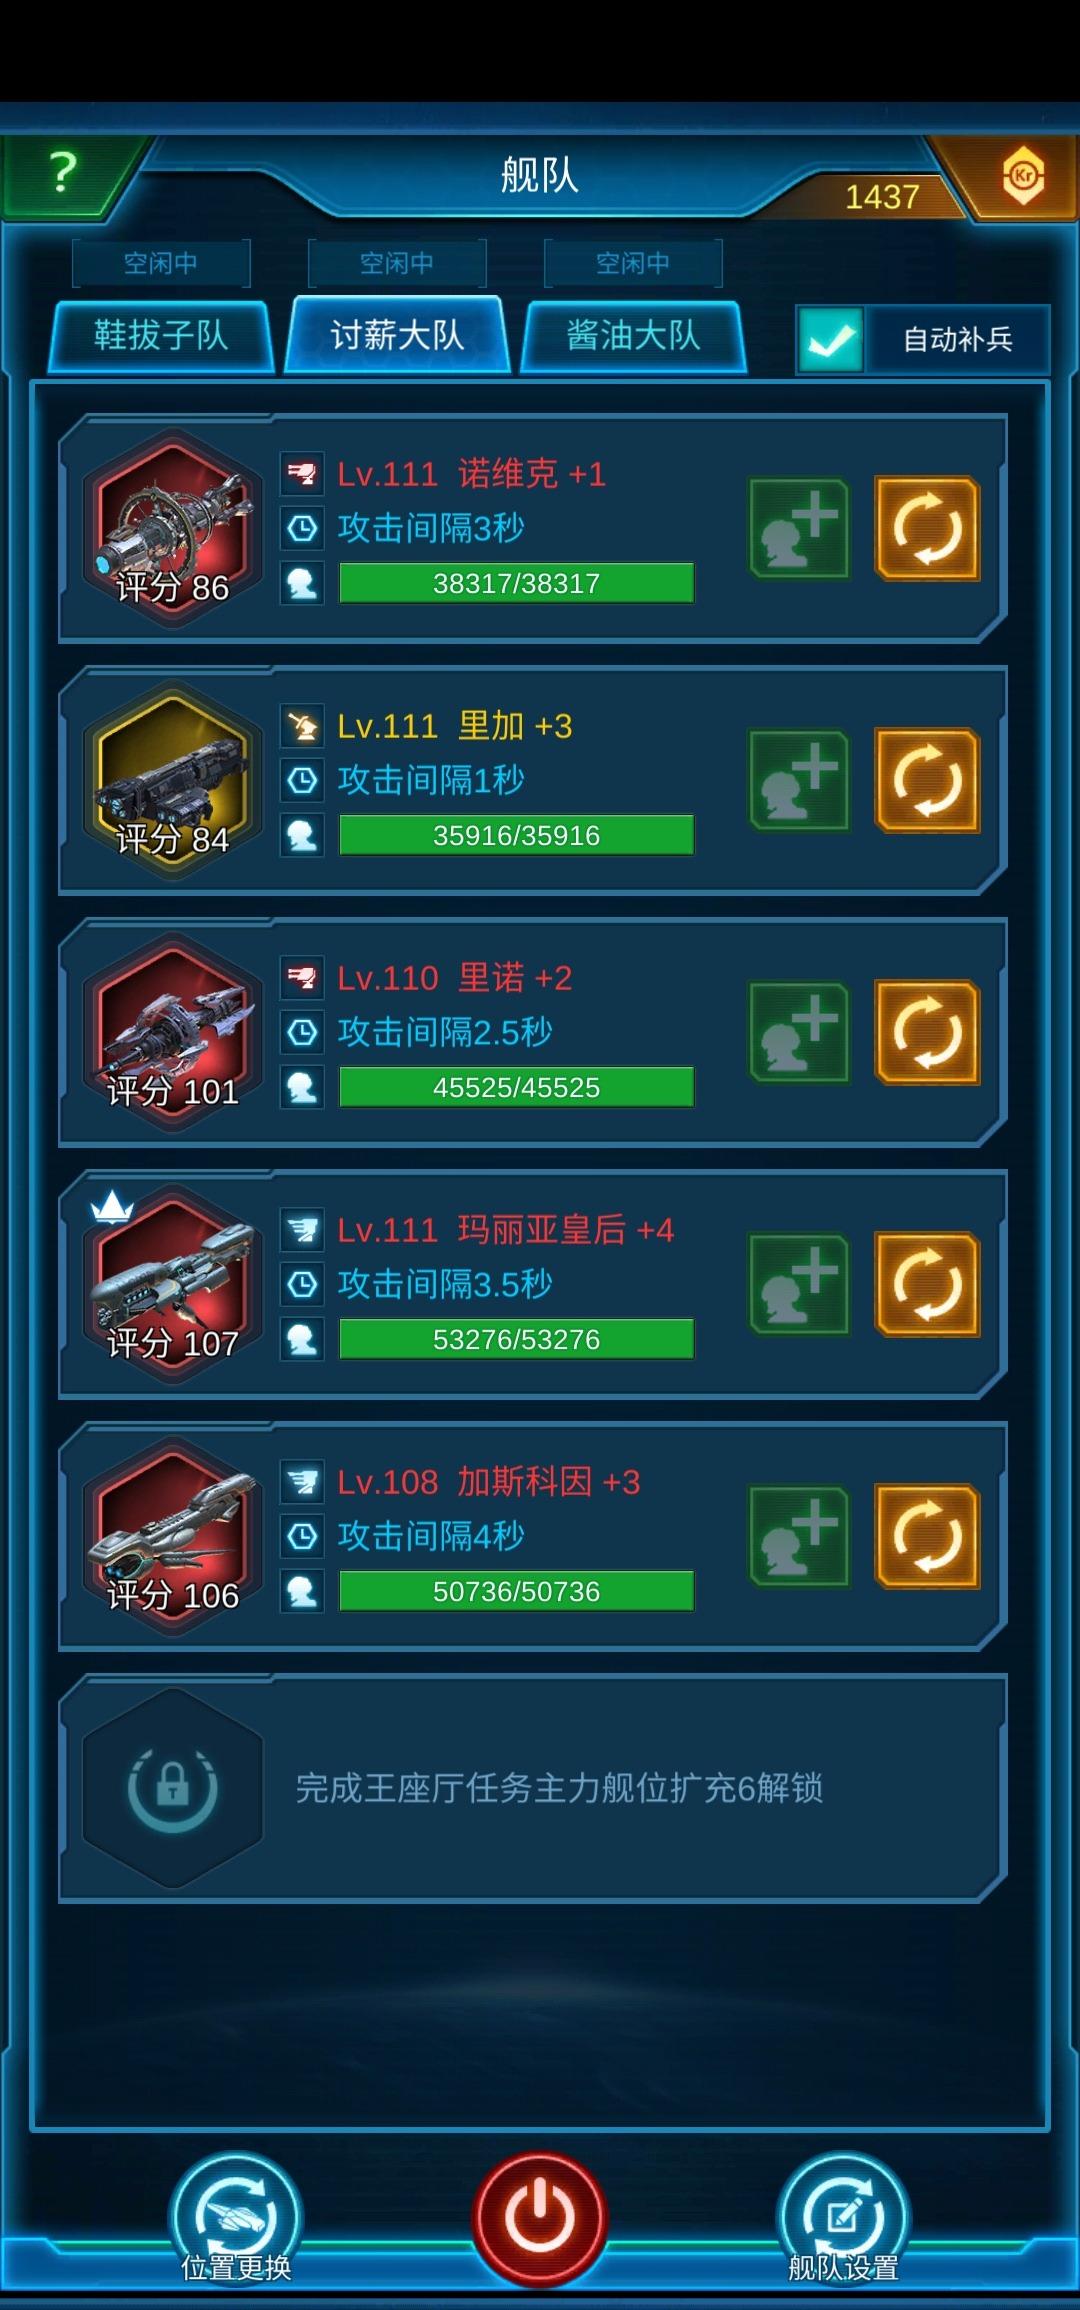 Screenshot_20200601_131212_com.jedigames.p16s.huawei.jpg